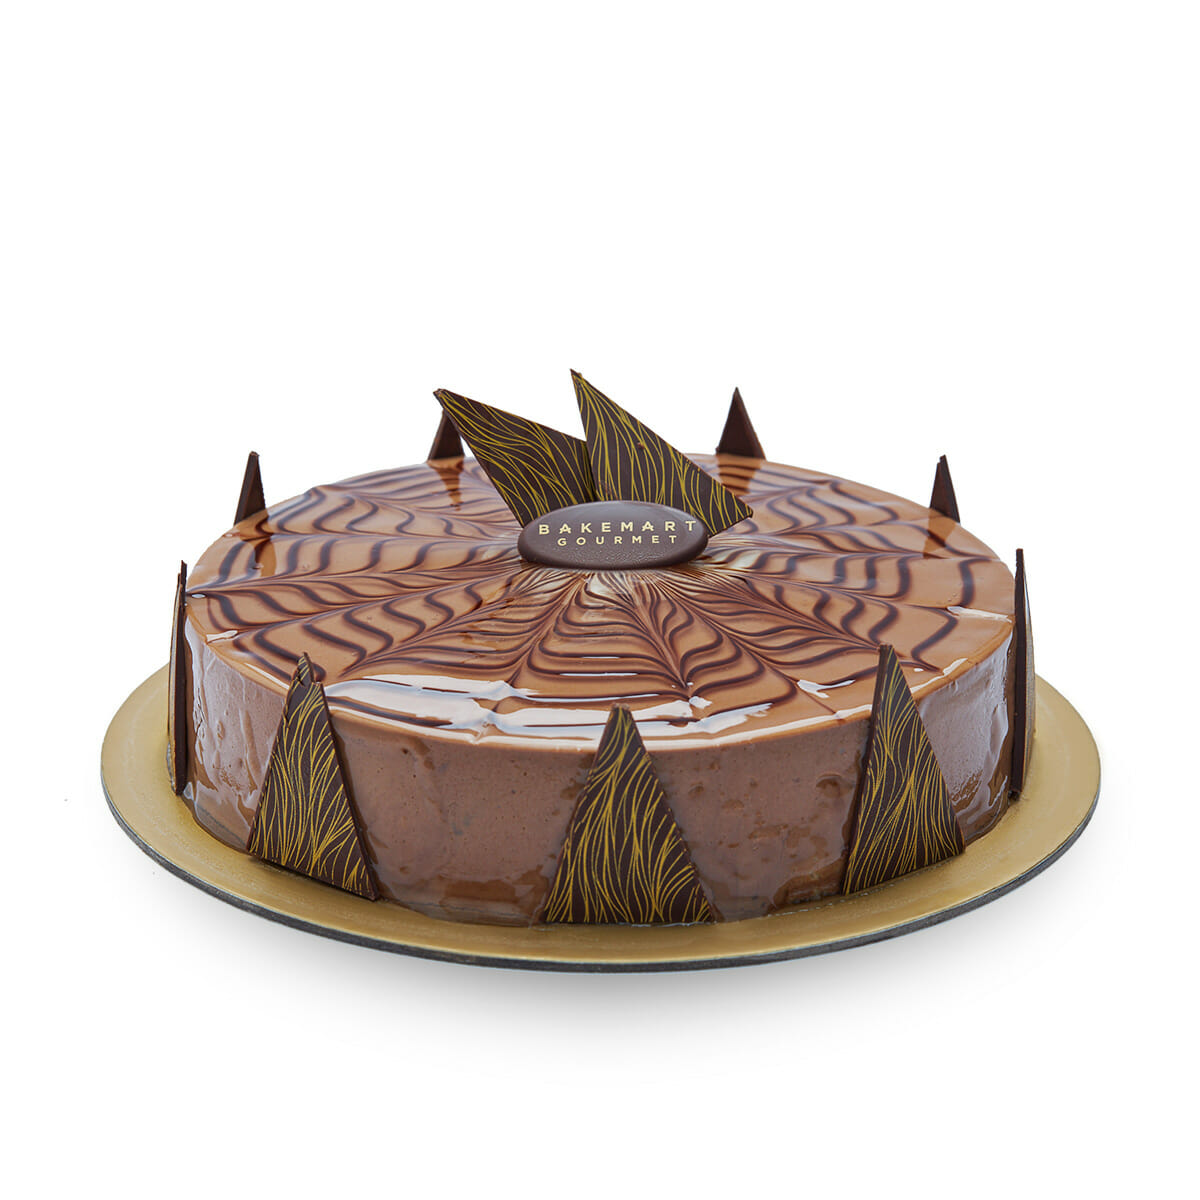 Cappuccino-Premium-Cake-Bakemart-Gourmet